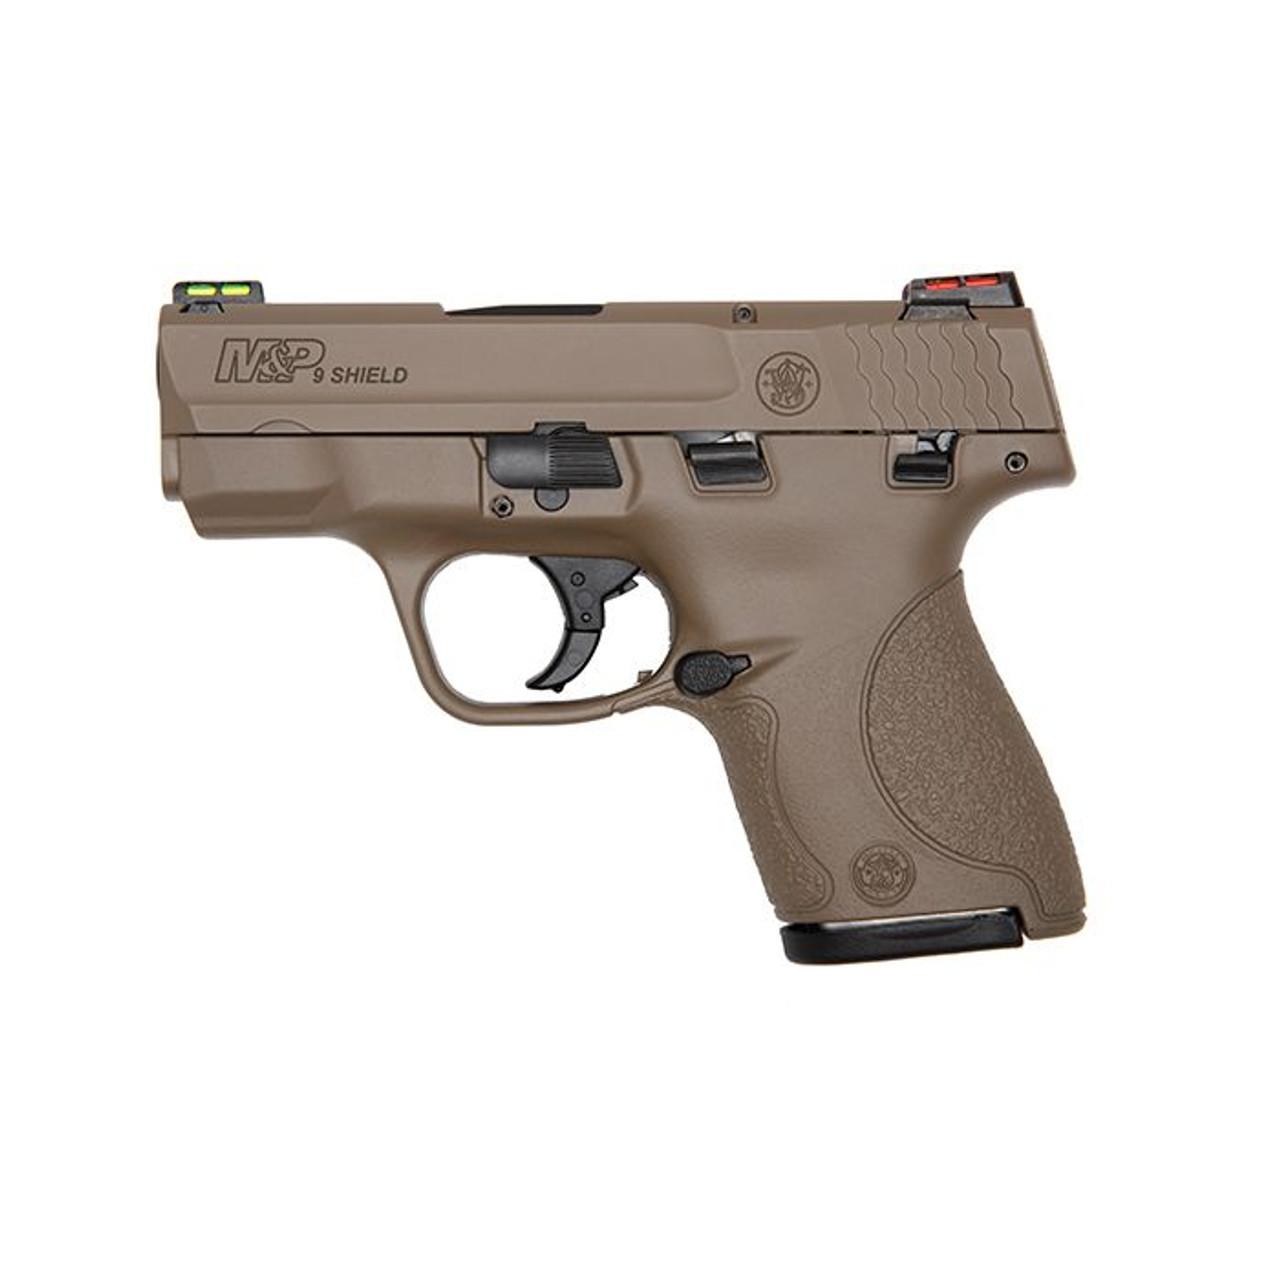 Smith & Wesson M&P 9 Shield Hi-Viz CALIFORNIA LEGAL - 9mm - FDE